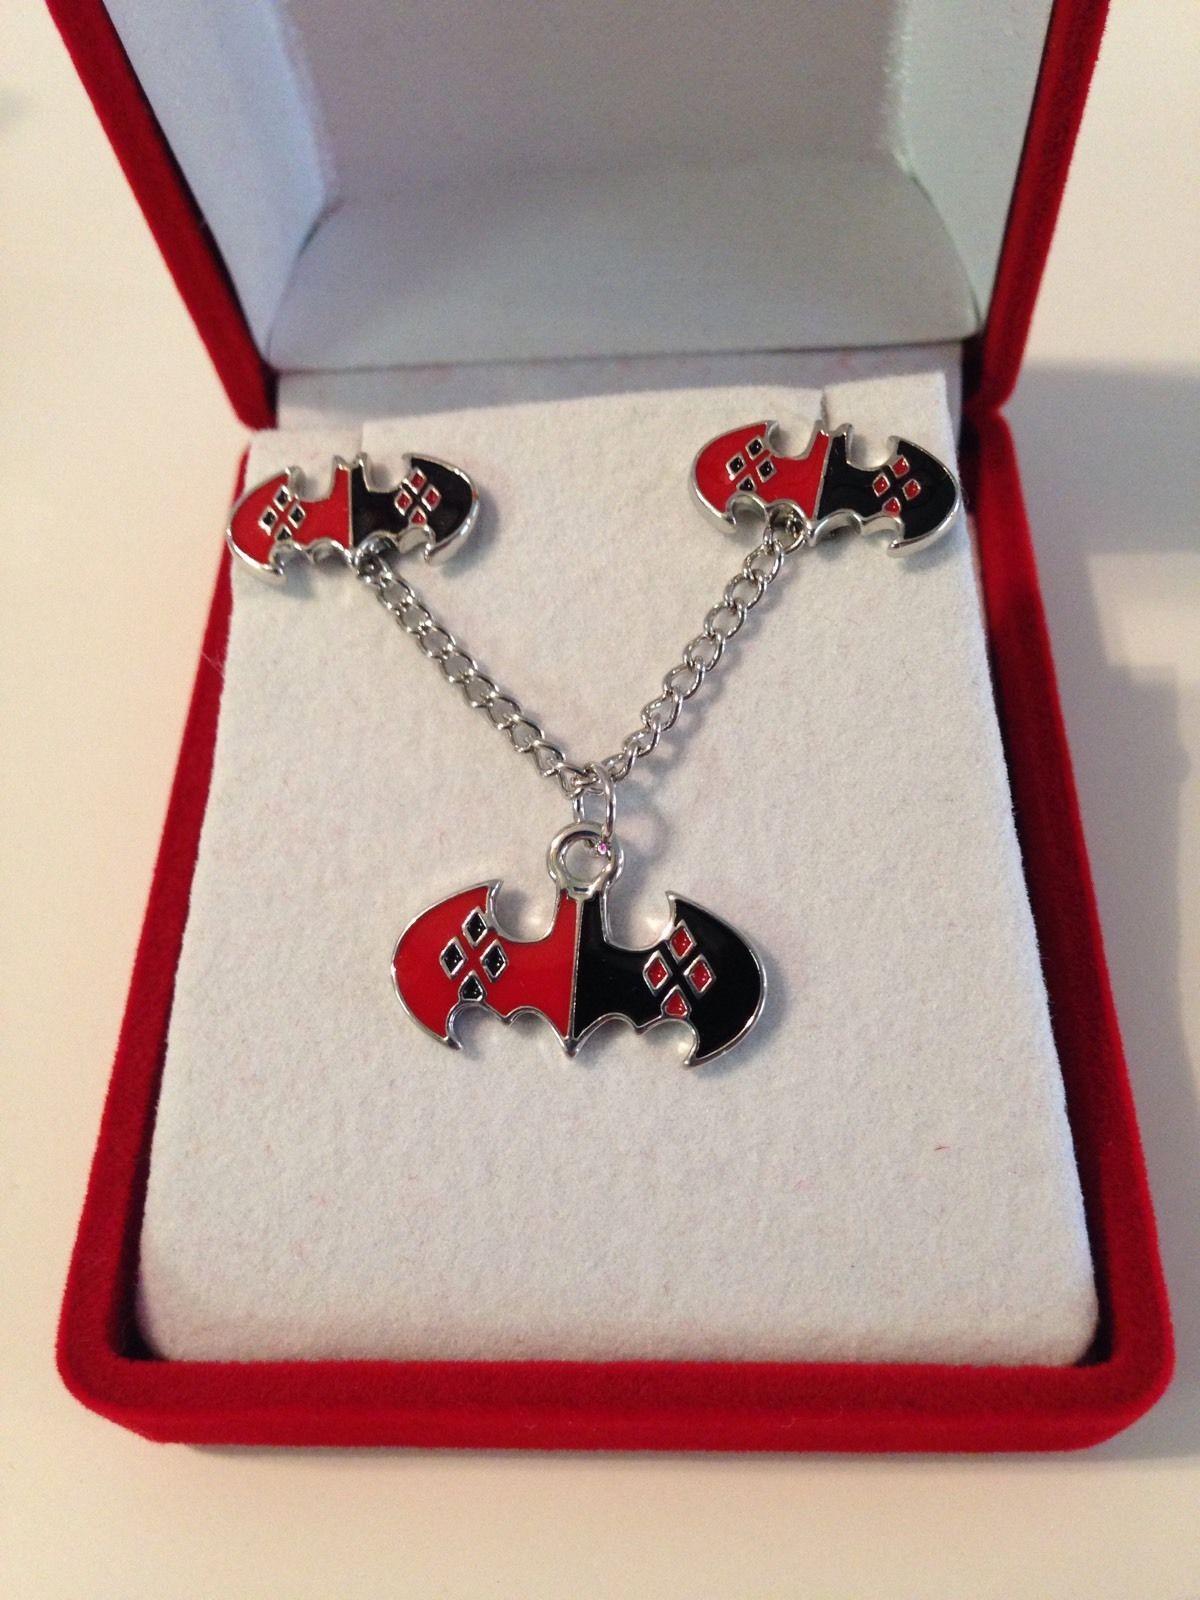 Batman Harley Quinn Earrings Necklace Set Christmas   eBay. Batman Harley Quinn Earrings Necklace Set Christmas   eBay